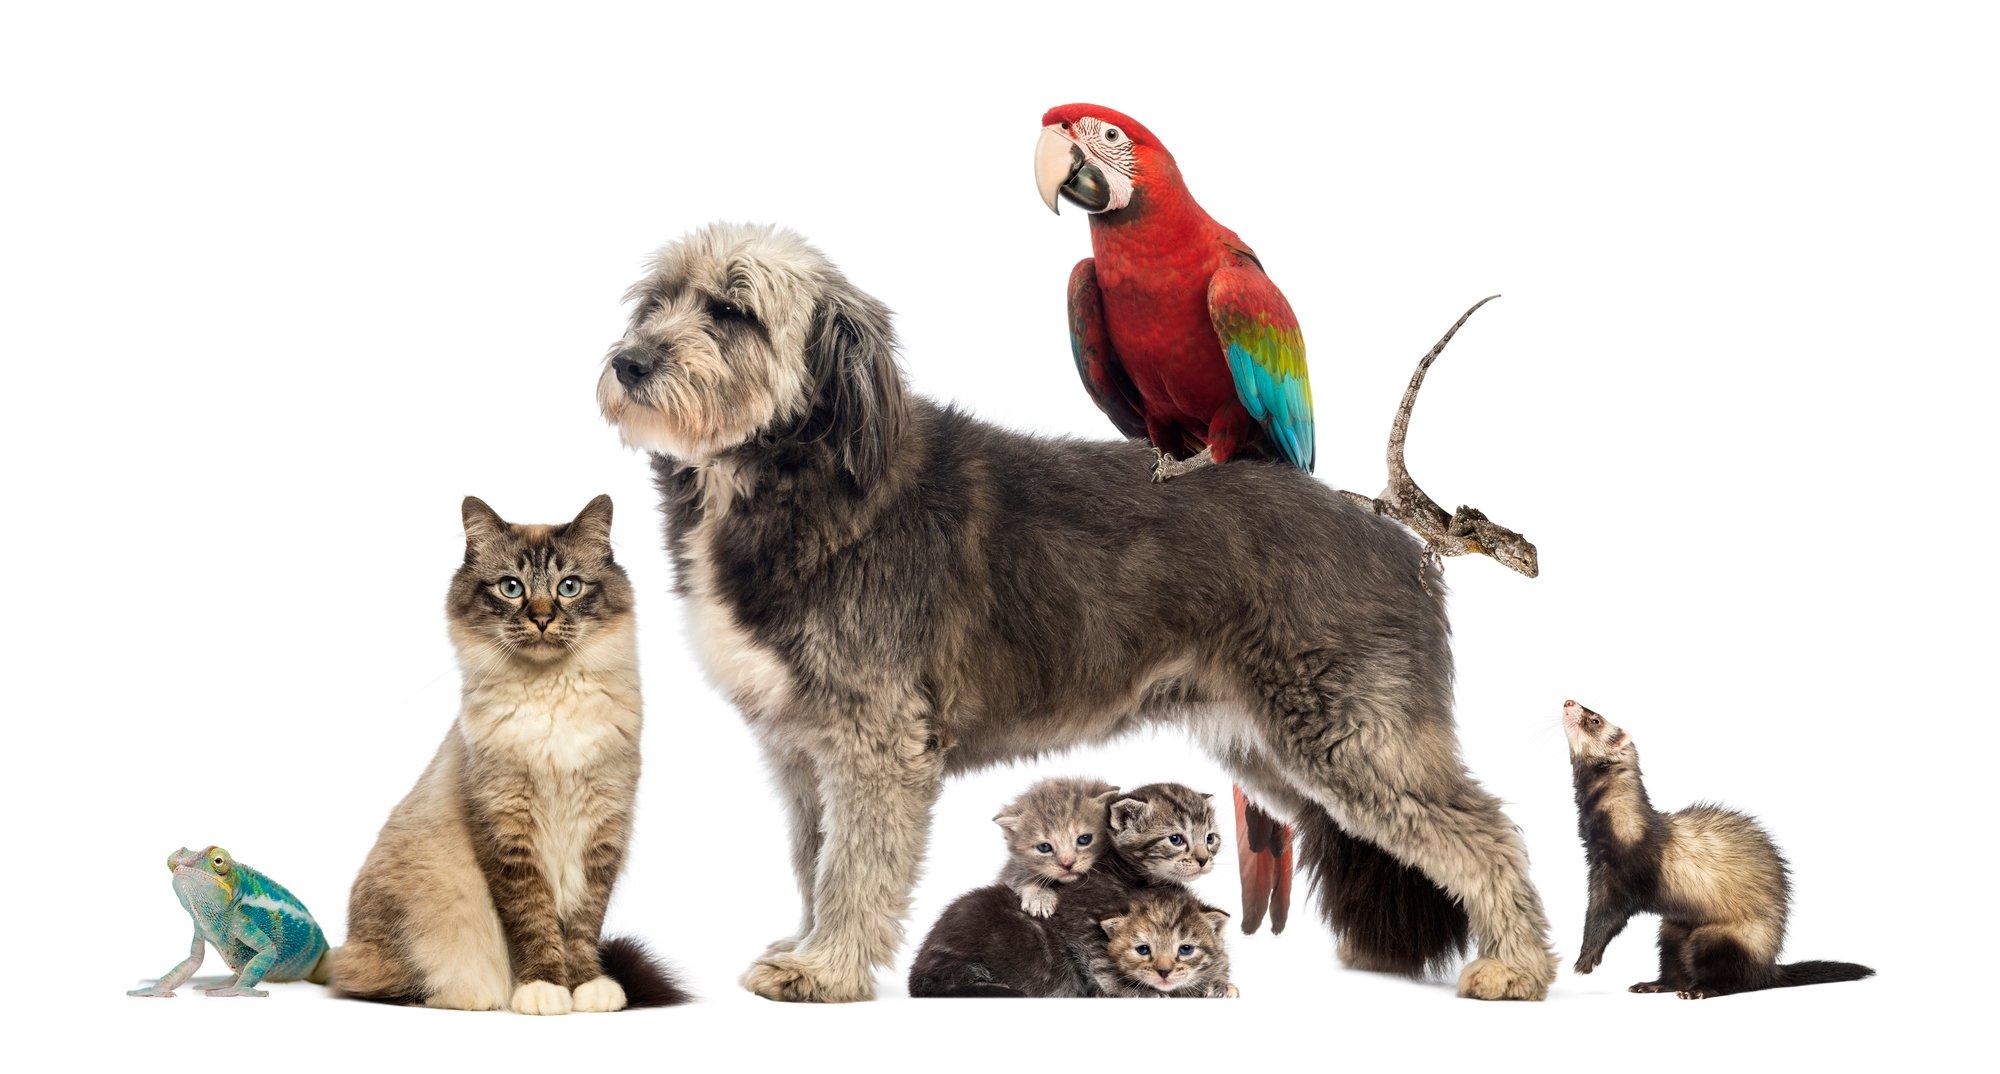 Group of pets,Group of pets - Dog, cat, bird, reptile, rabbit